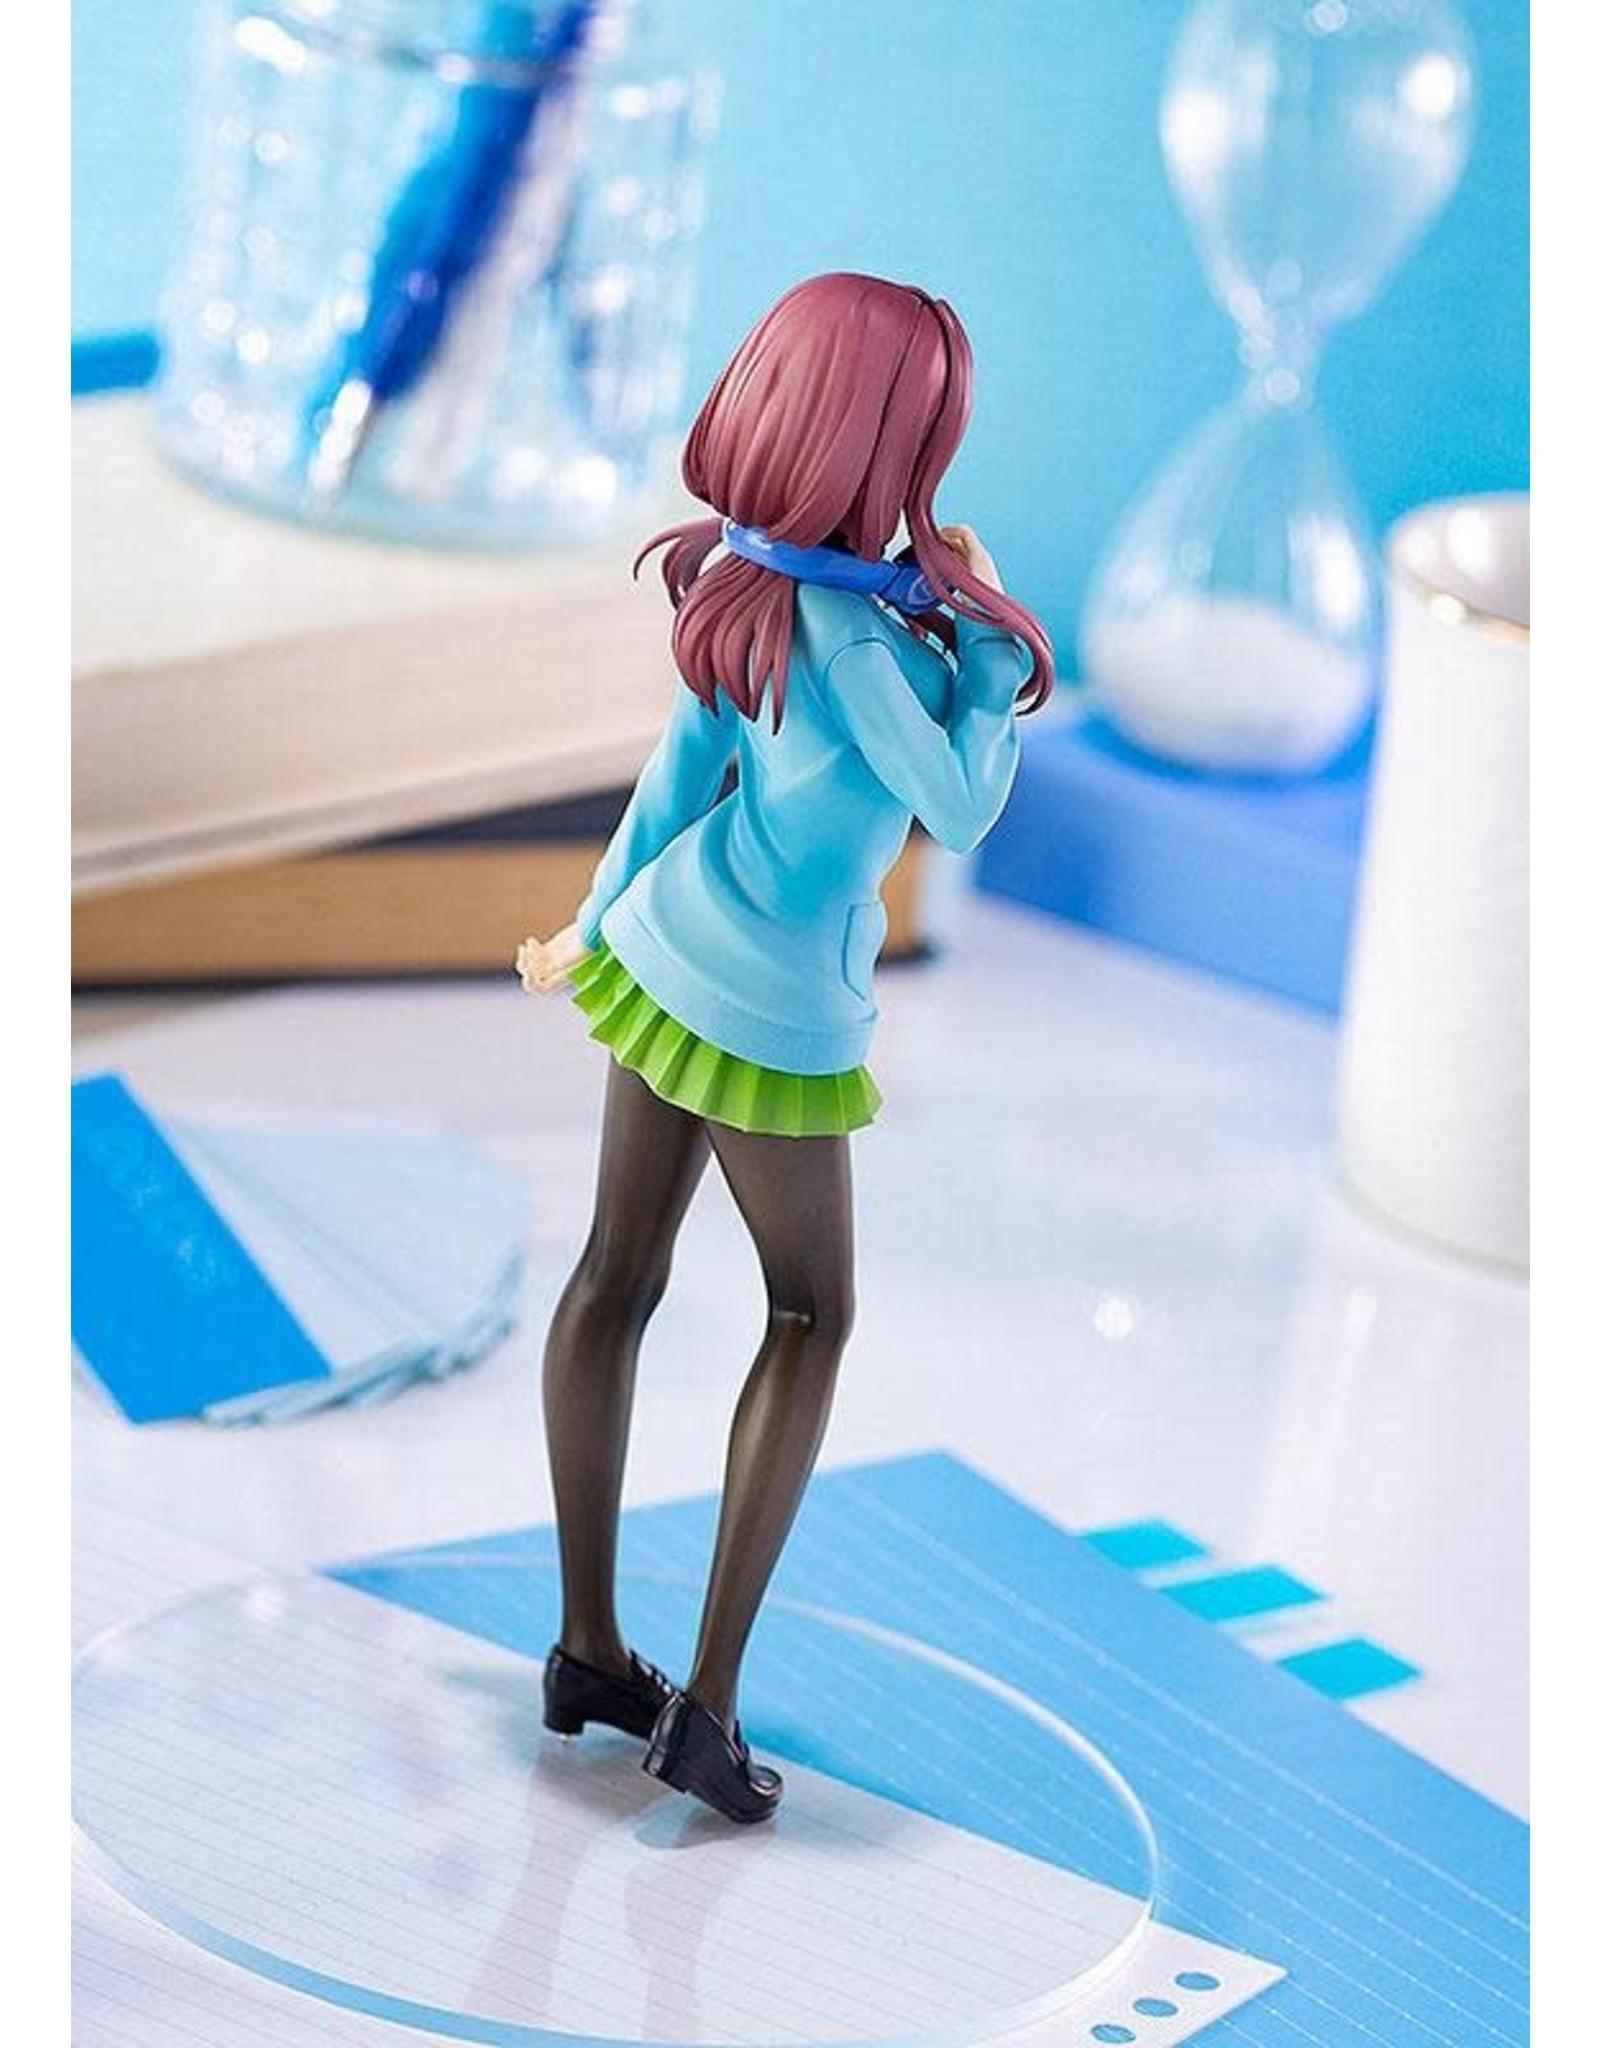 The Quintessential Quintuplets - Miku Nakano - Pop Up Parade PVC Statue - 17 cm